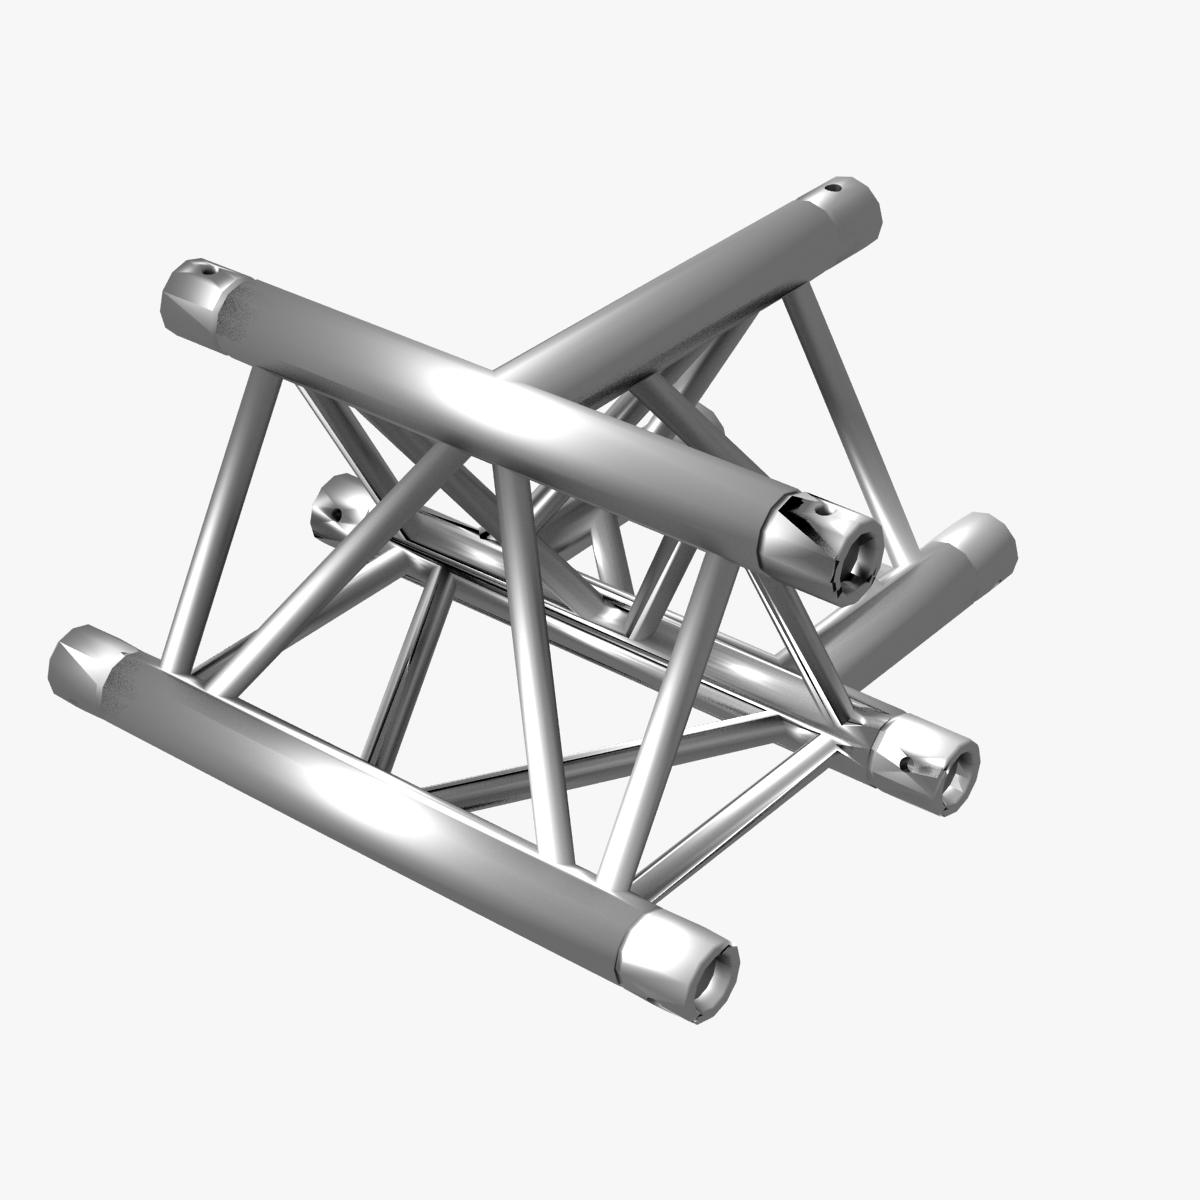 Triangular Truss Cross T Junction 84 3d model 3ds max dxf fbx b3d c4d  obj 268956